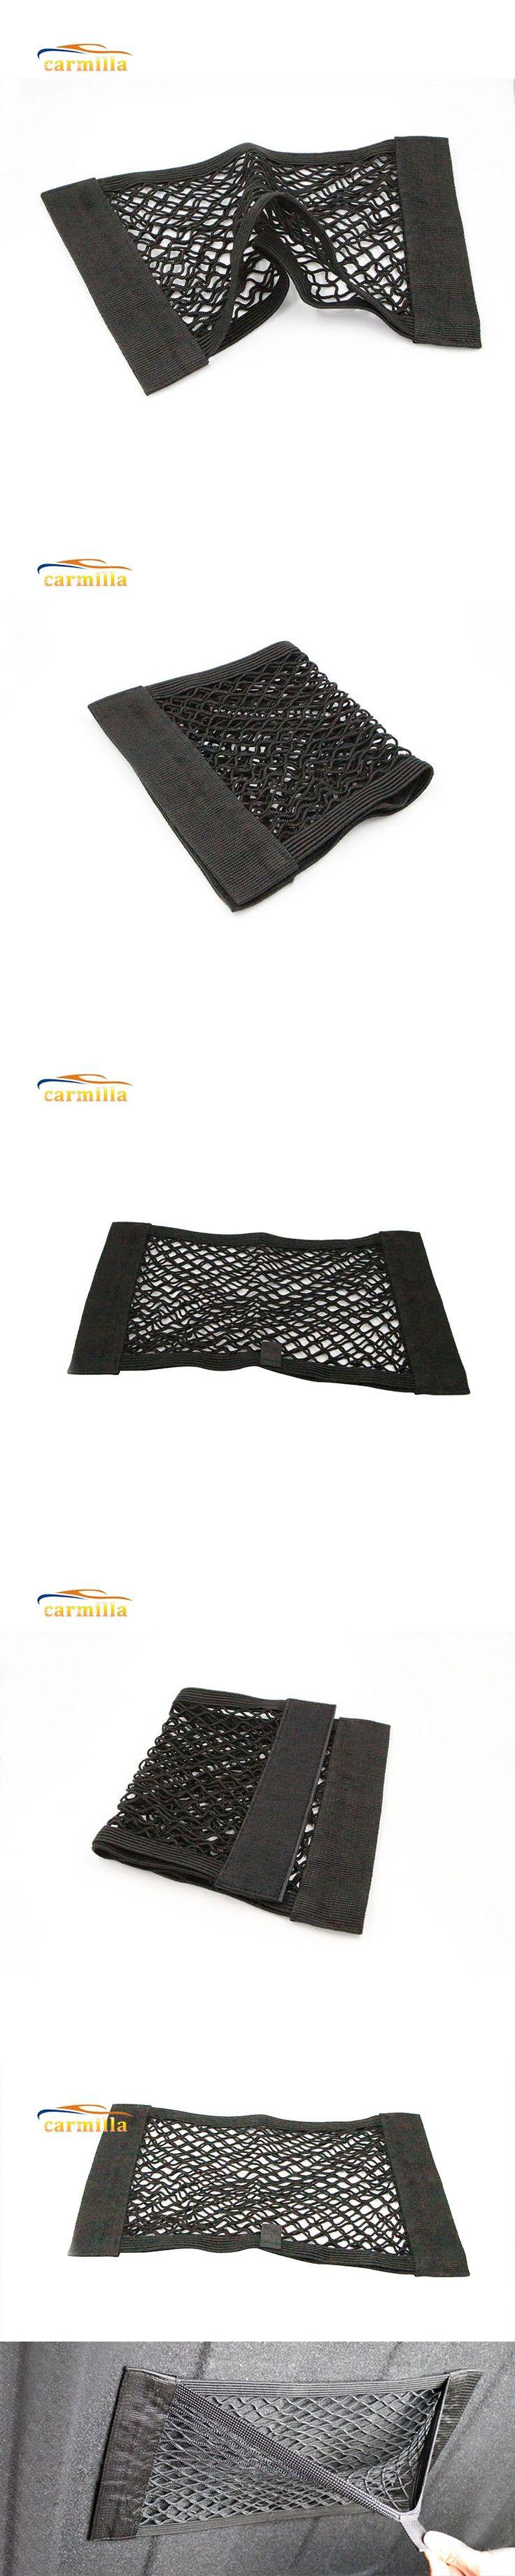 40*25 Cm Car Trunk Nylon Rope Net Luggage Net with Backing for Mazda 2 Mazda 3 Mazda 5 Mazda 6 CX5 CX-5 CX7 CX9 Atenza Axela